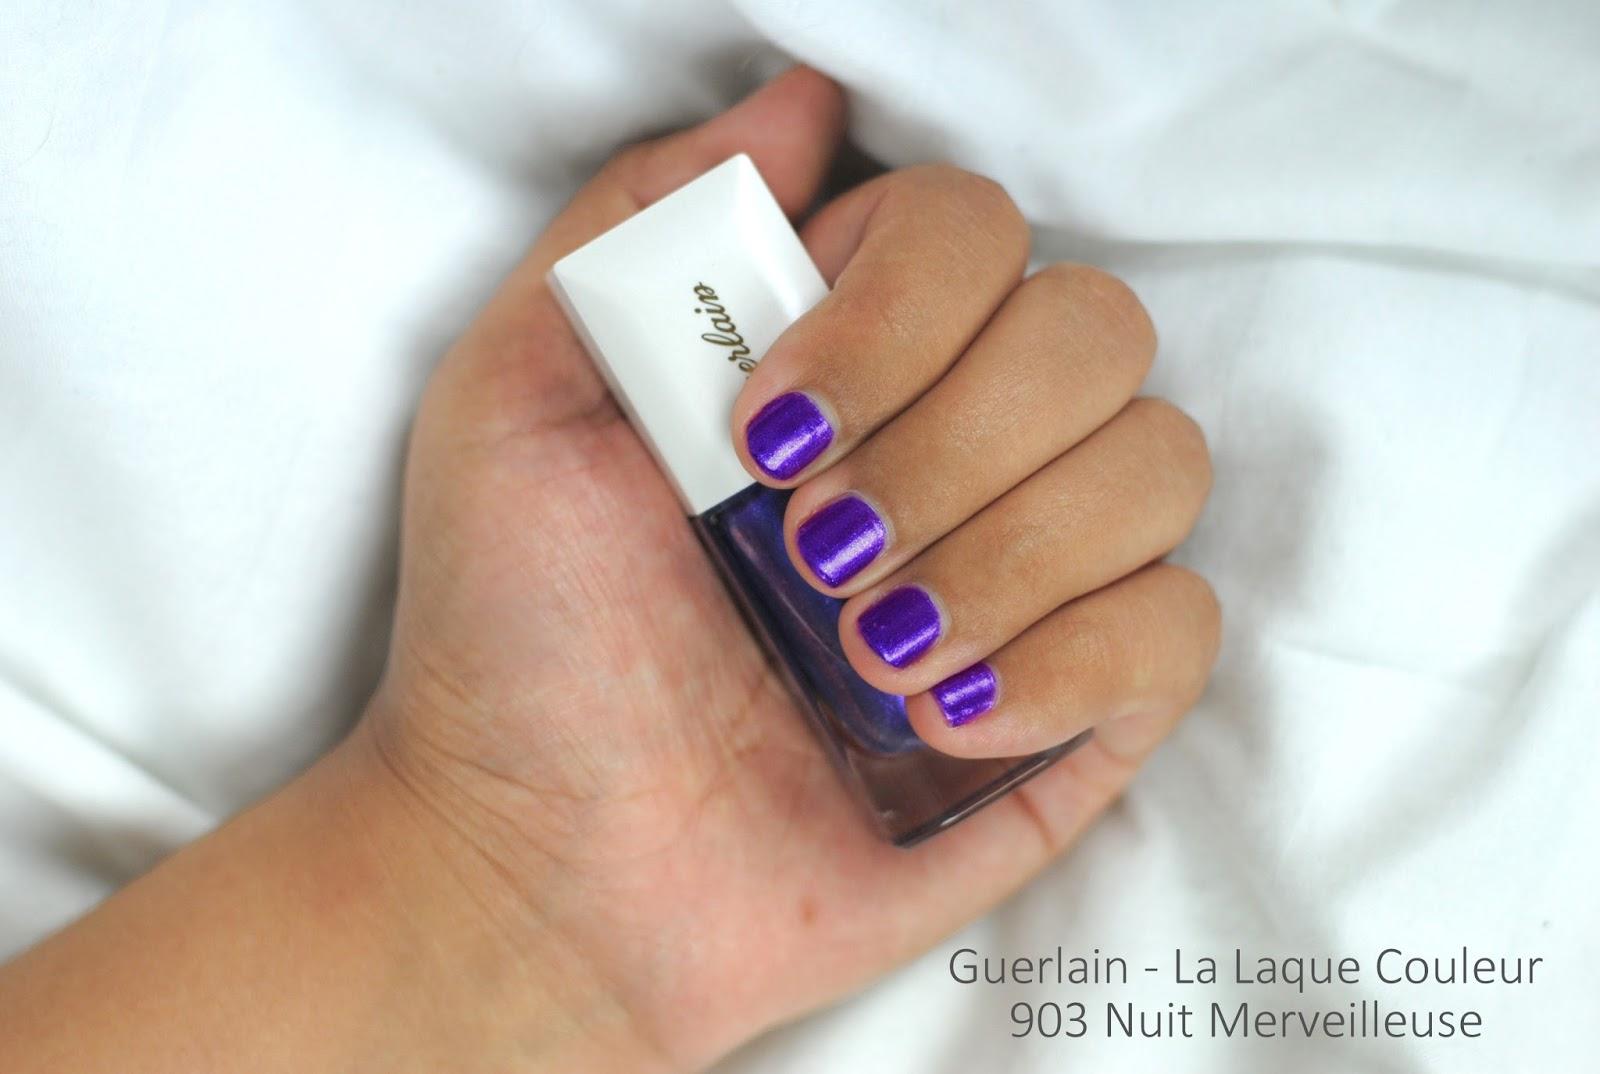 guerlain neiges merveilles review nail polish 903 Nuit Merveilleuse swatches swatch